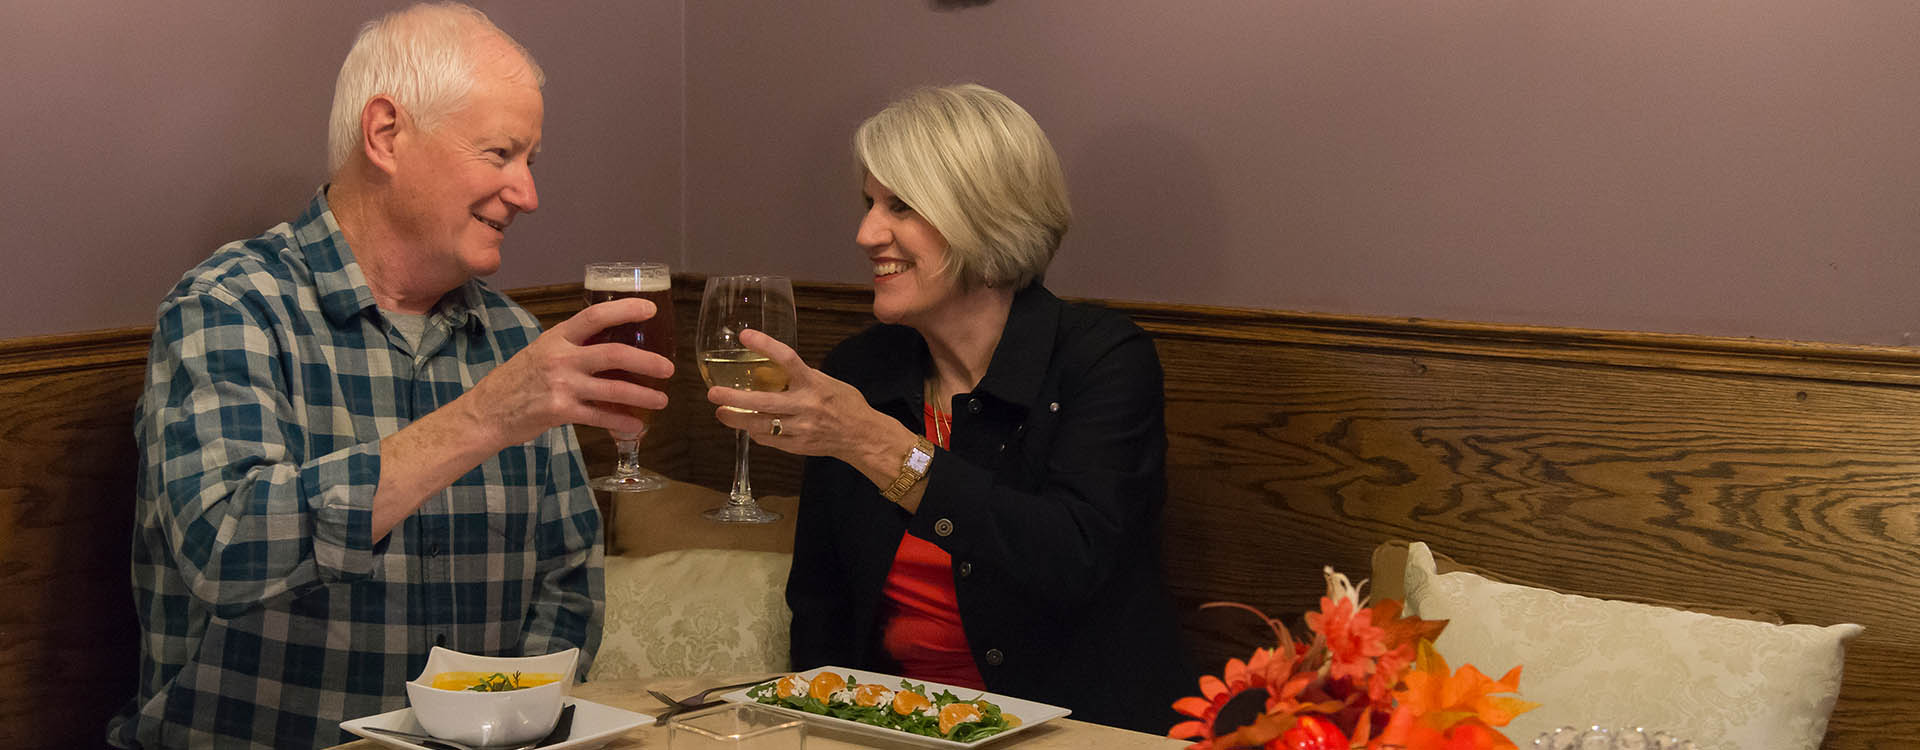 Dining Couple Banner Blog - Valentine Date Ideas